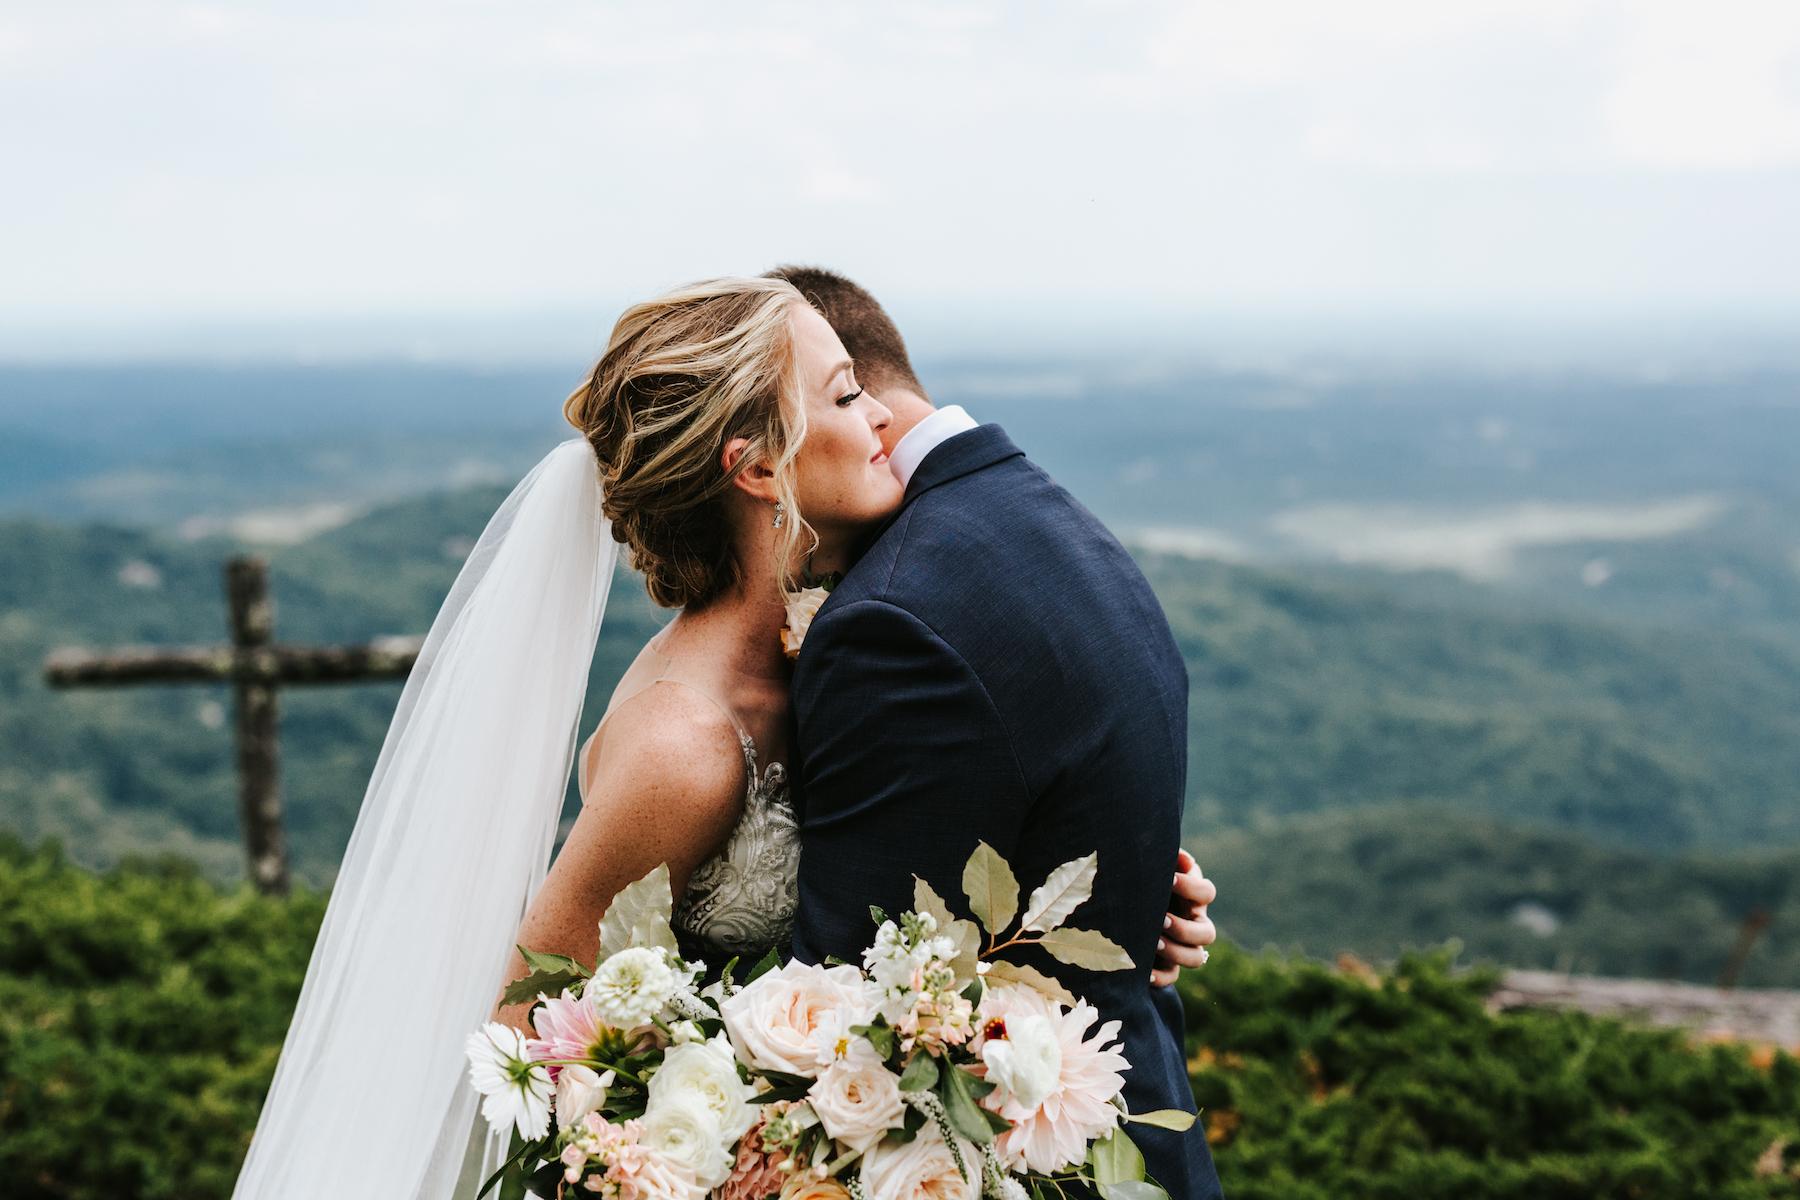 wedding-engagement-photographer-spartanburg-greenville-columbia-carolina-south-north-500.JPG